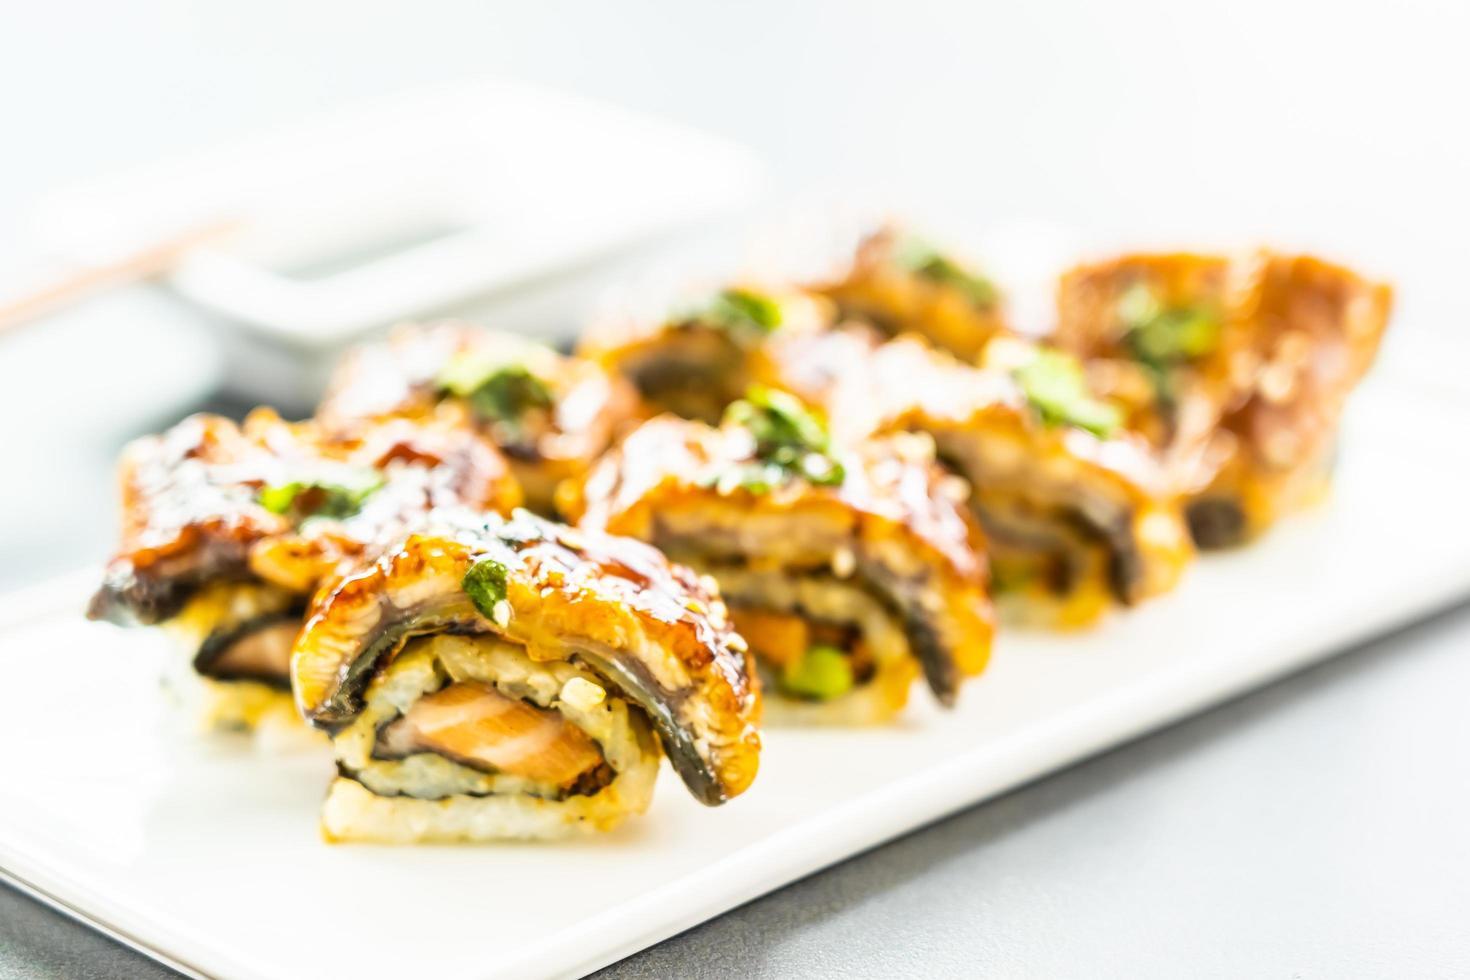 Sushi maki à l'anguille grillée ou poisson unagi photo